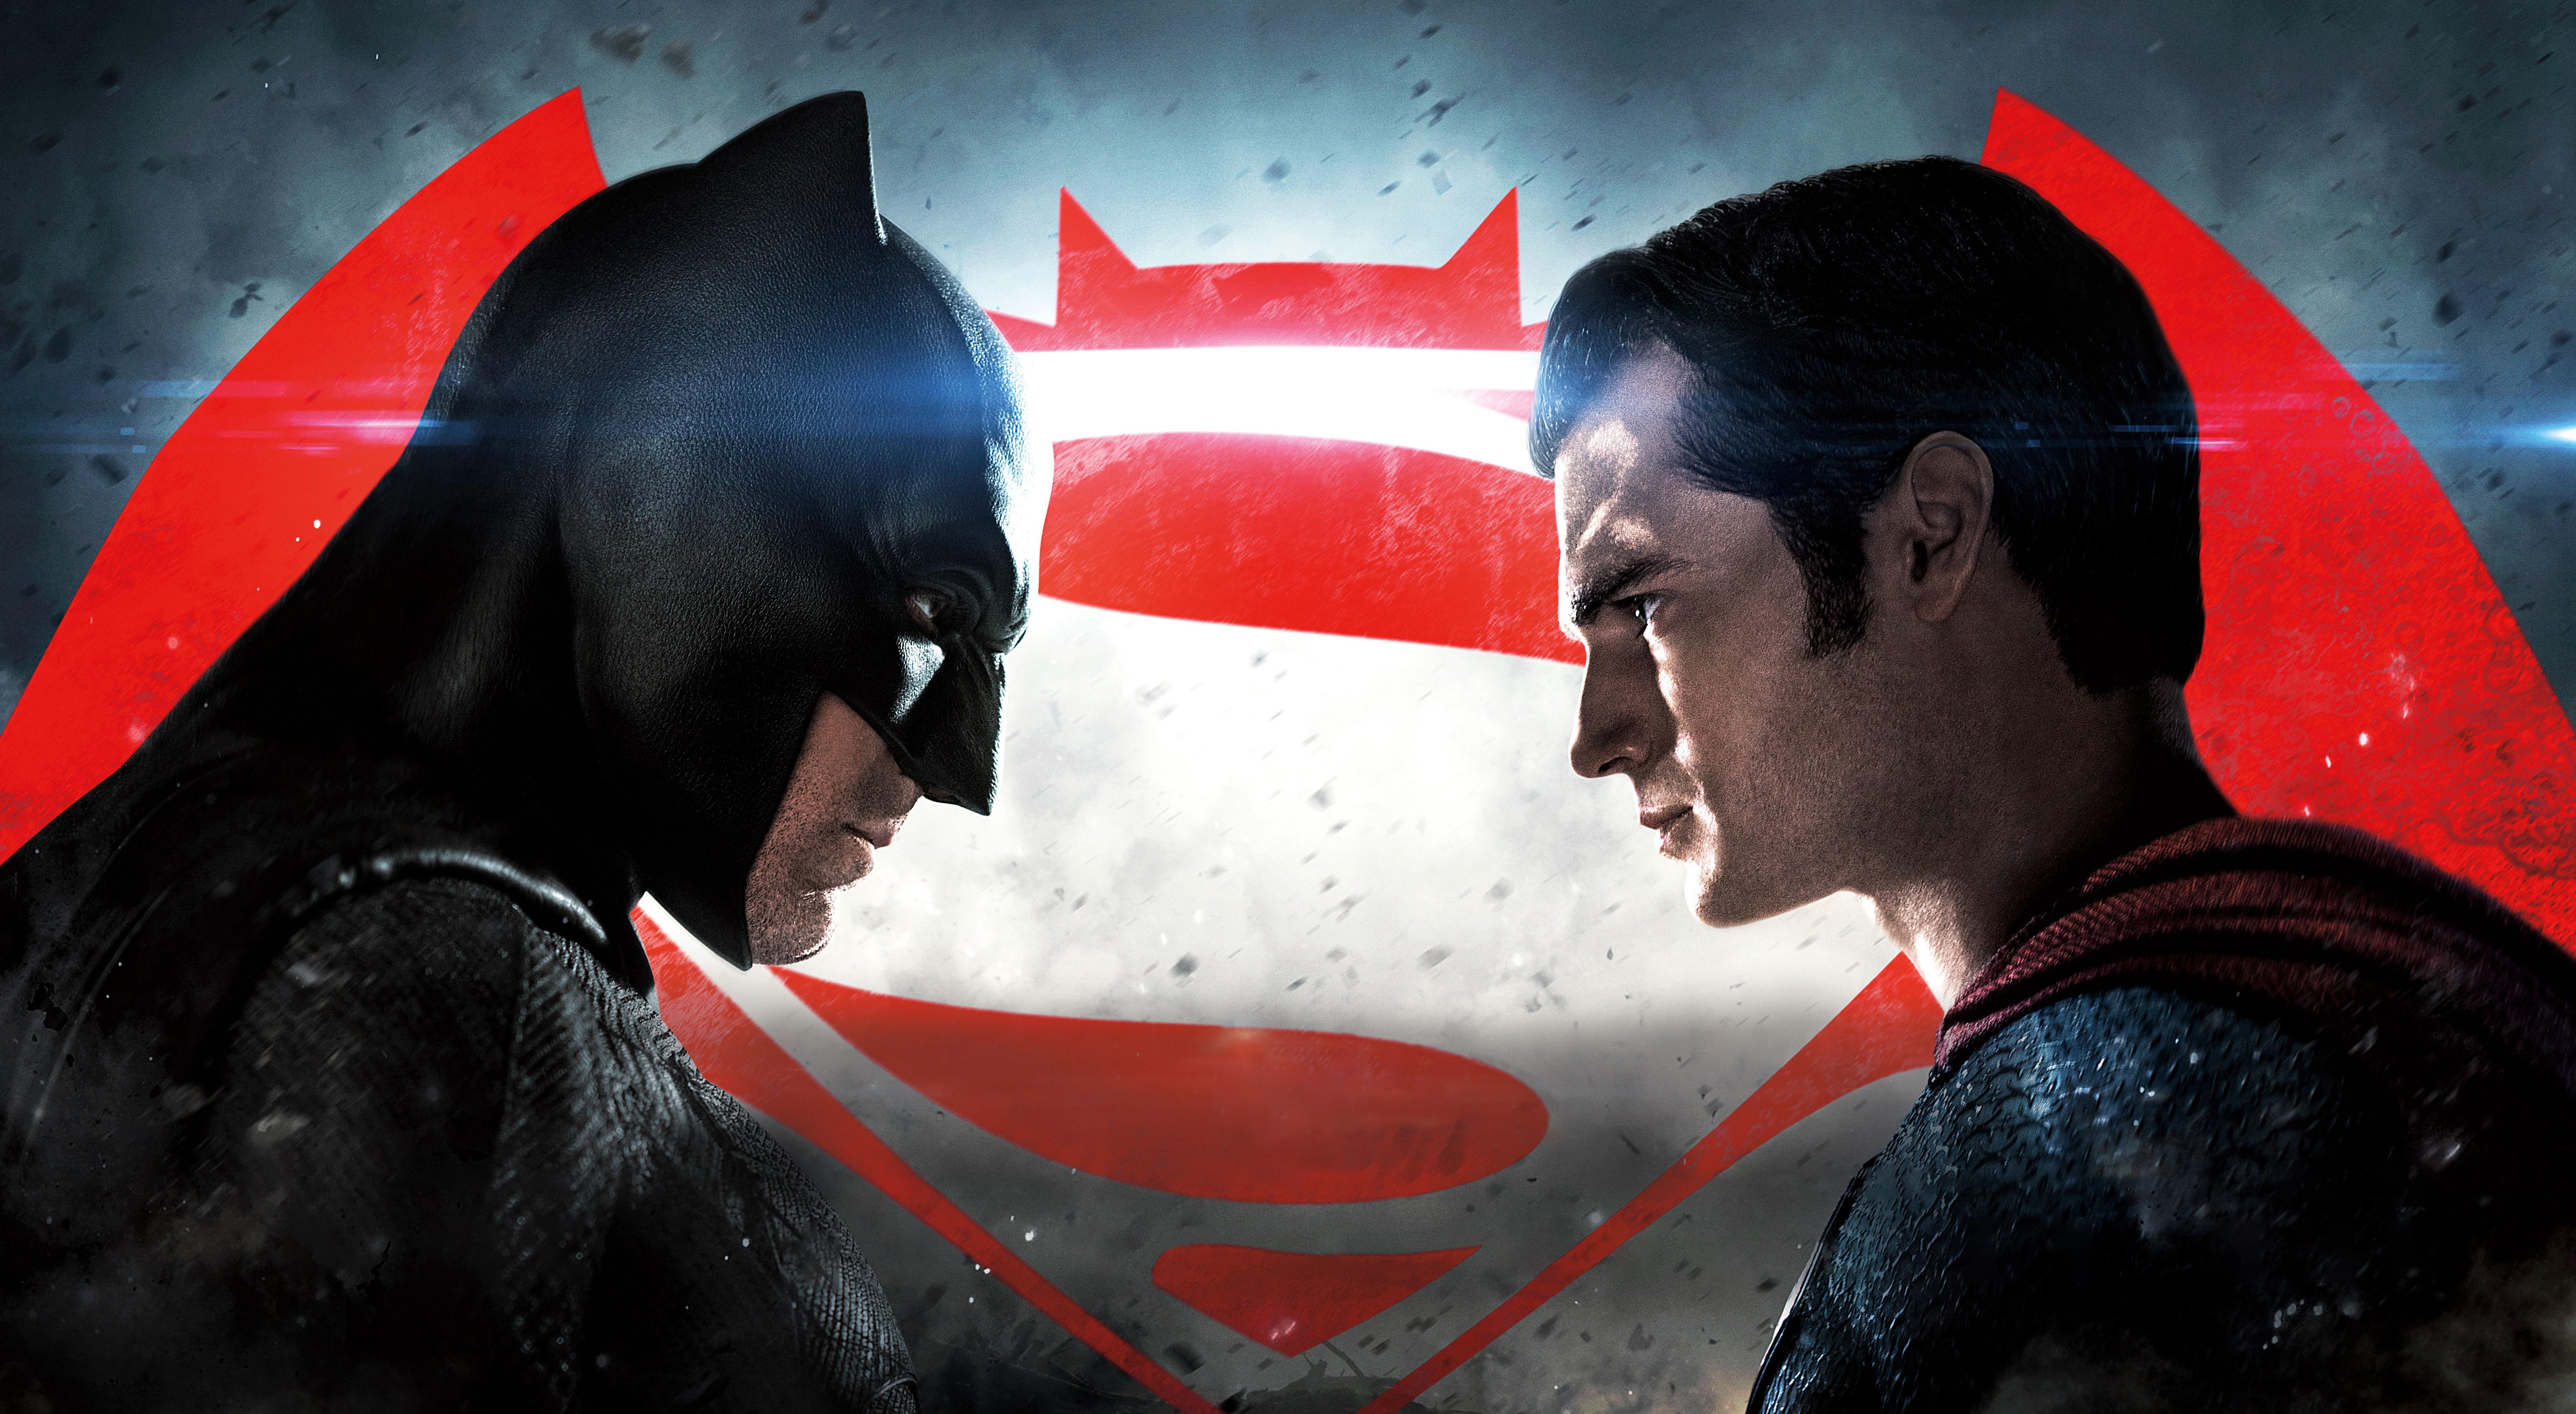 Batman vs superman clipart clip art black and white stock Analyzing the Flaws of Batman v Superman: Dawn of Justice | The ... clip art black and white stock